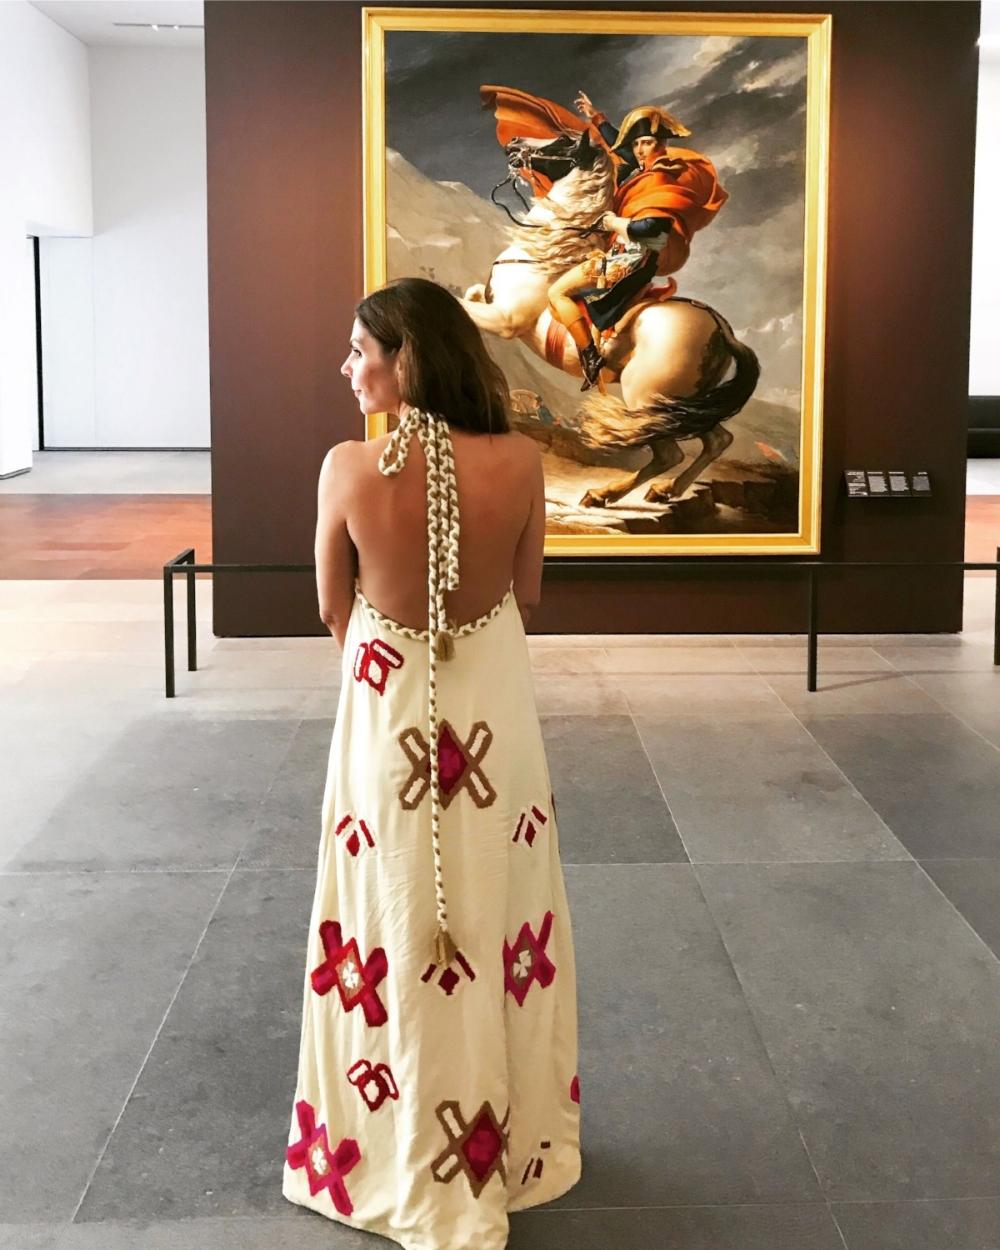 Maria-Brito_Art-Dubai-8.jpg